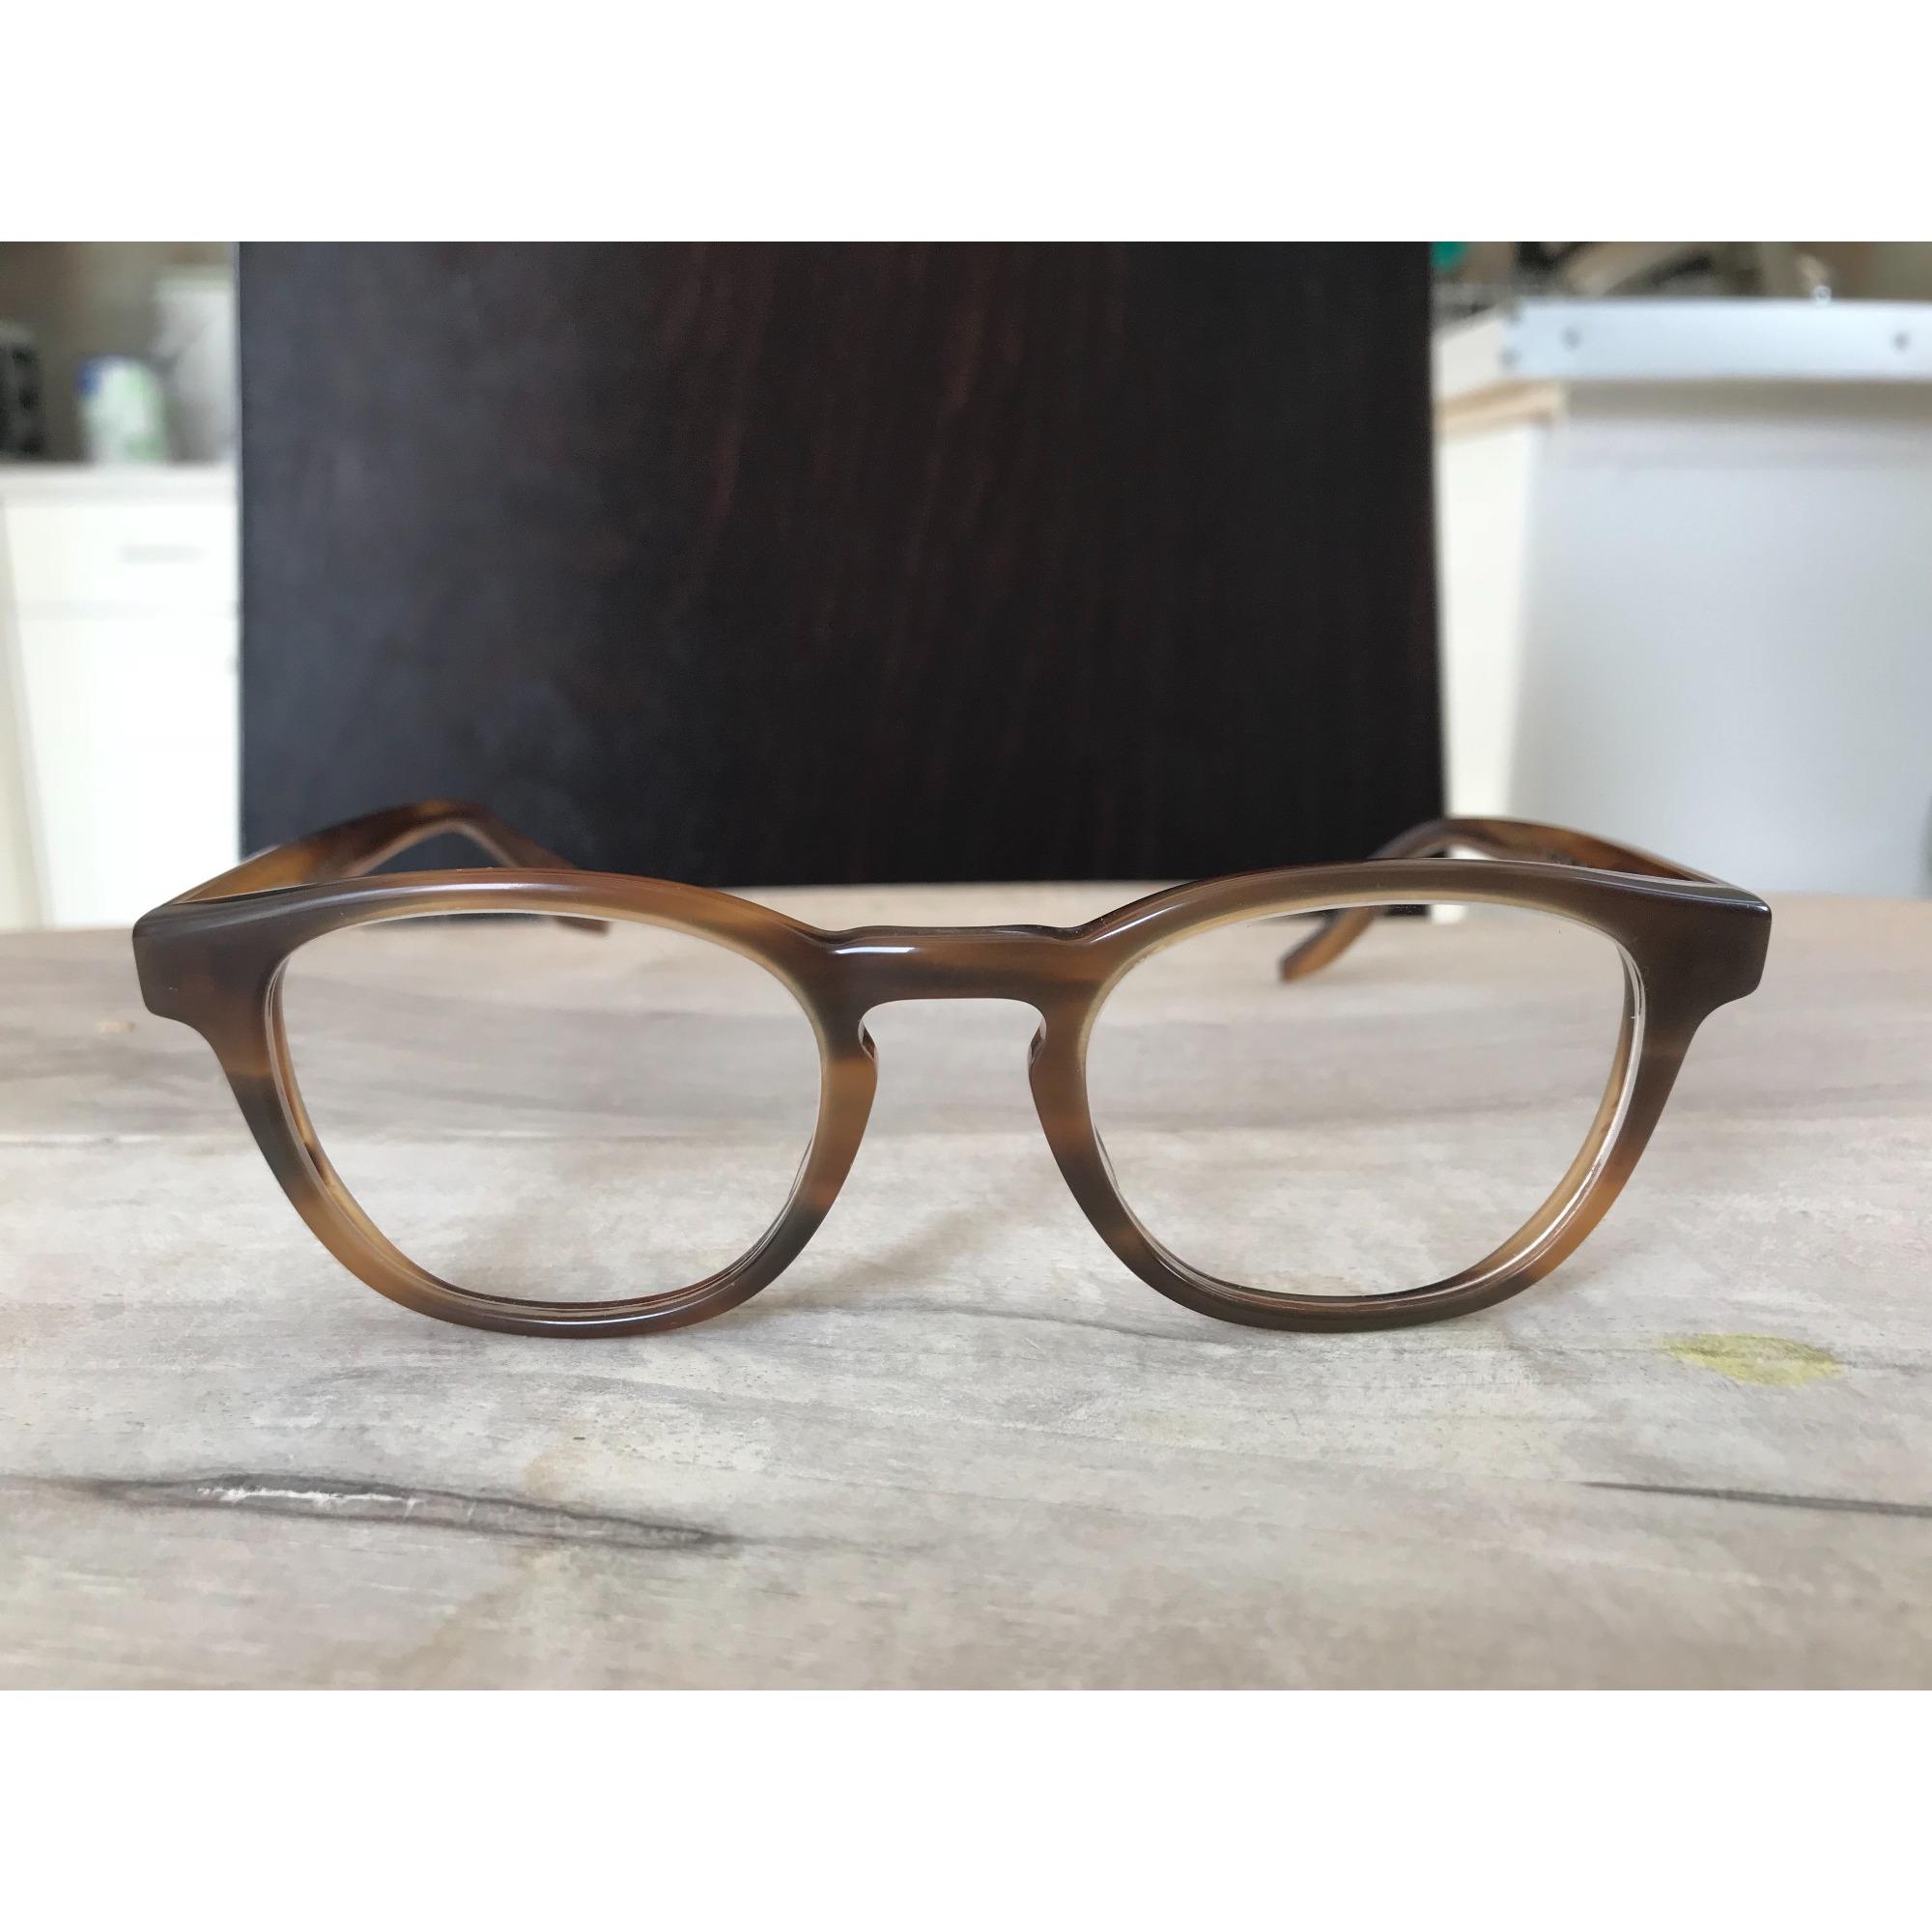 68ccba0d335a61 Monture de lunettes BARTON PERREIRA marron vendu par Revergio - 8117700